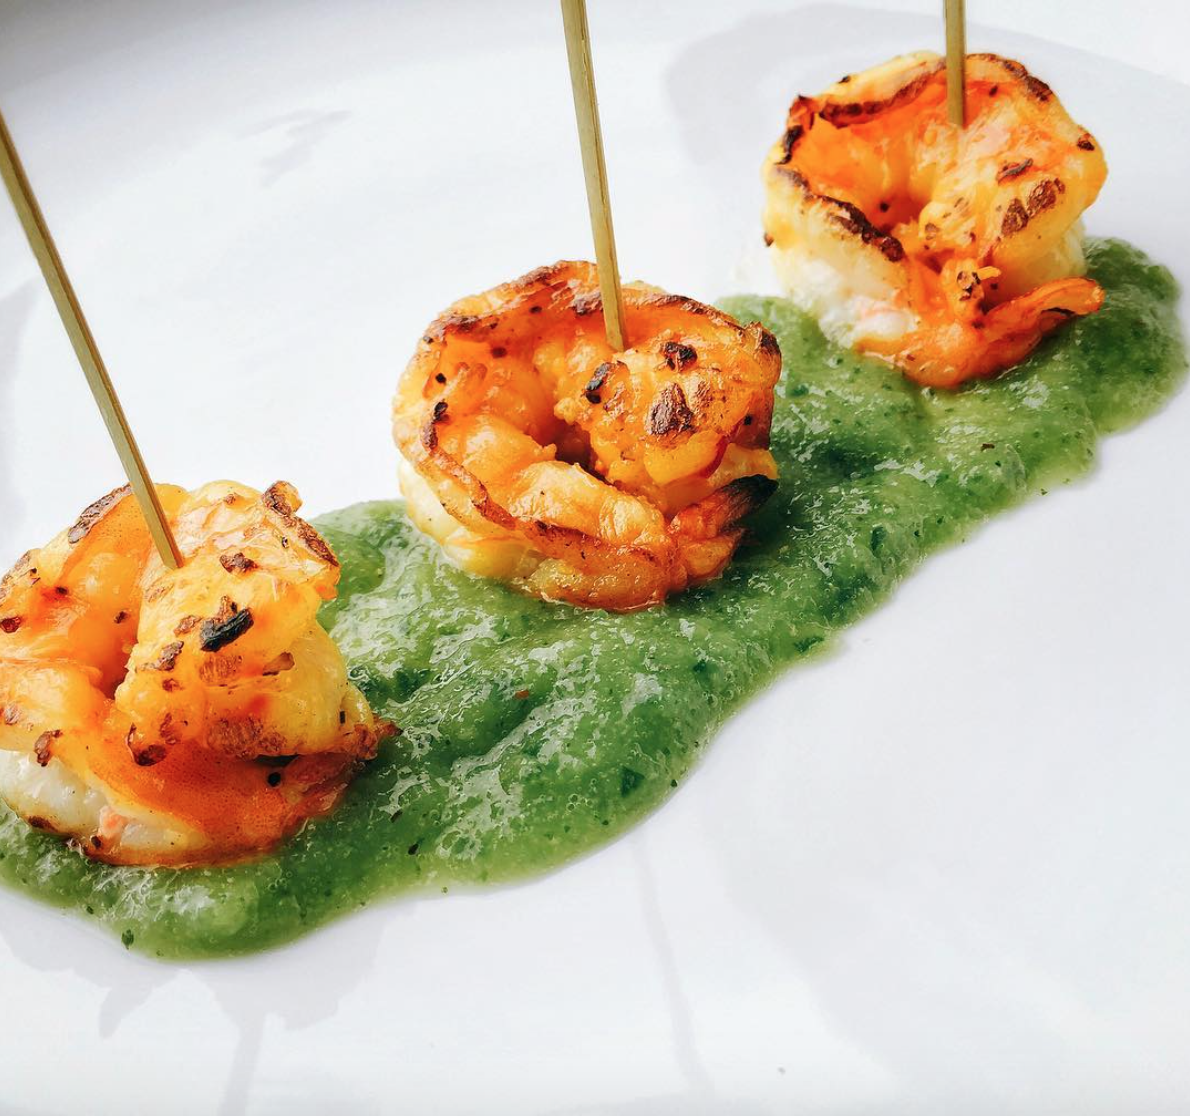 - Saffron shrimp with green gazpacho sauce